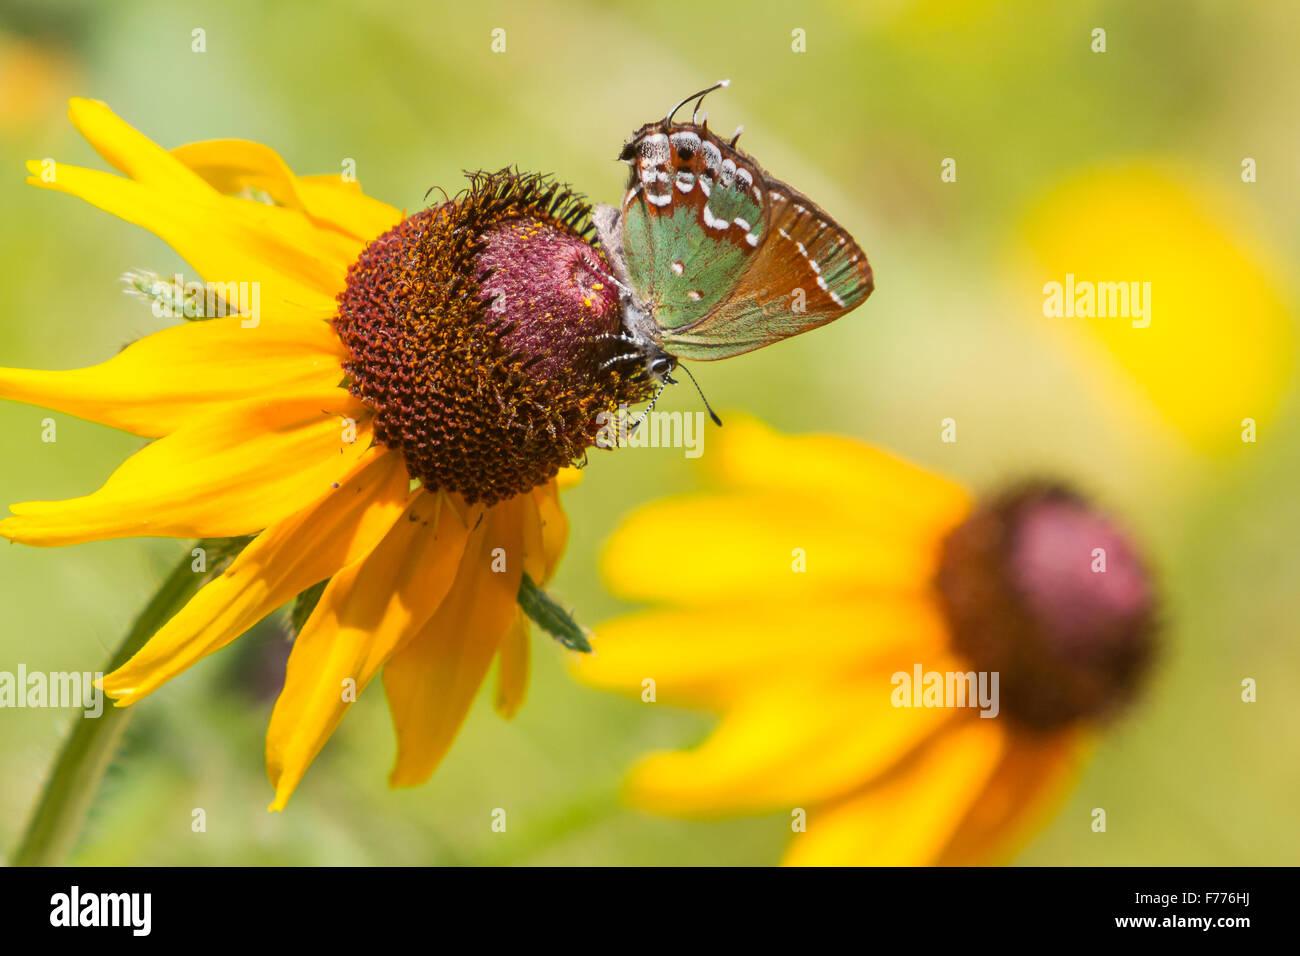 Juniper, Callophrys Hairstreak gryneus, alimentándose de una Blackeyed Susan, Rudbeckia hirta Foto de stock